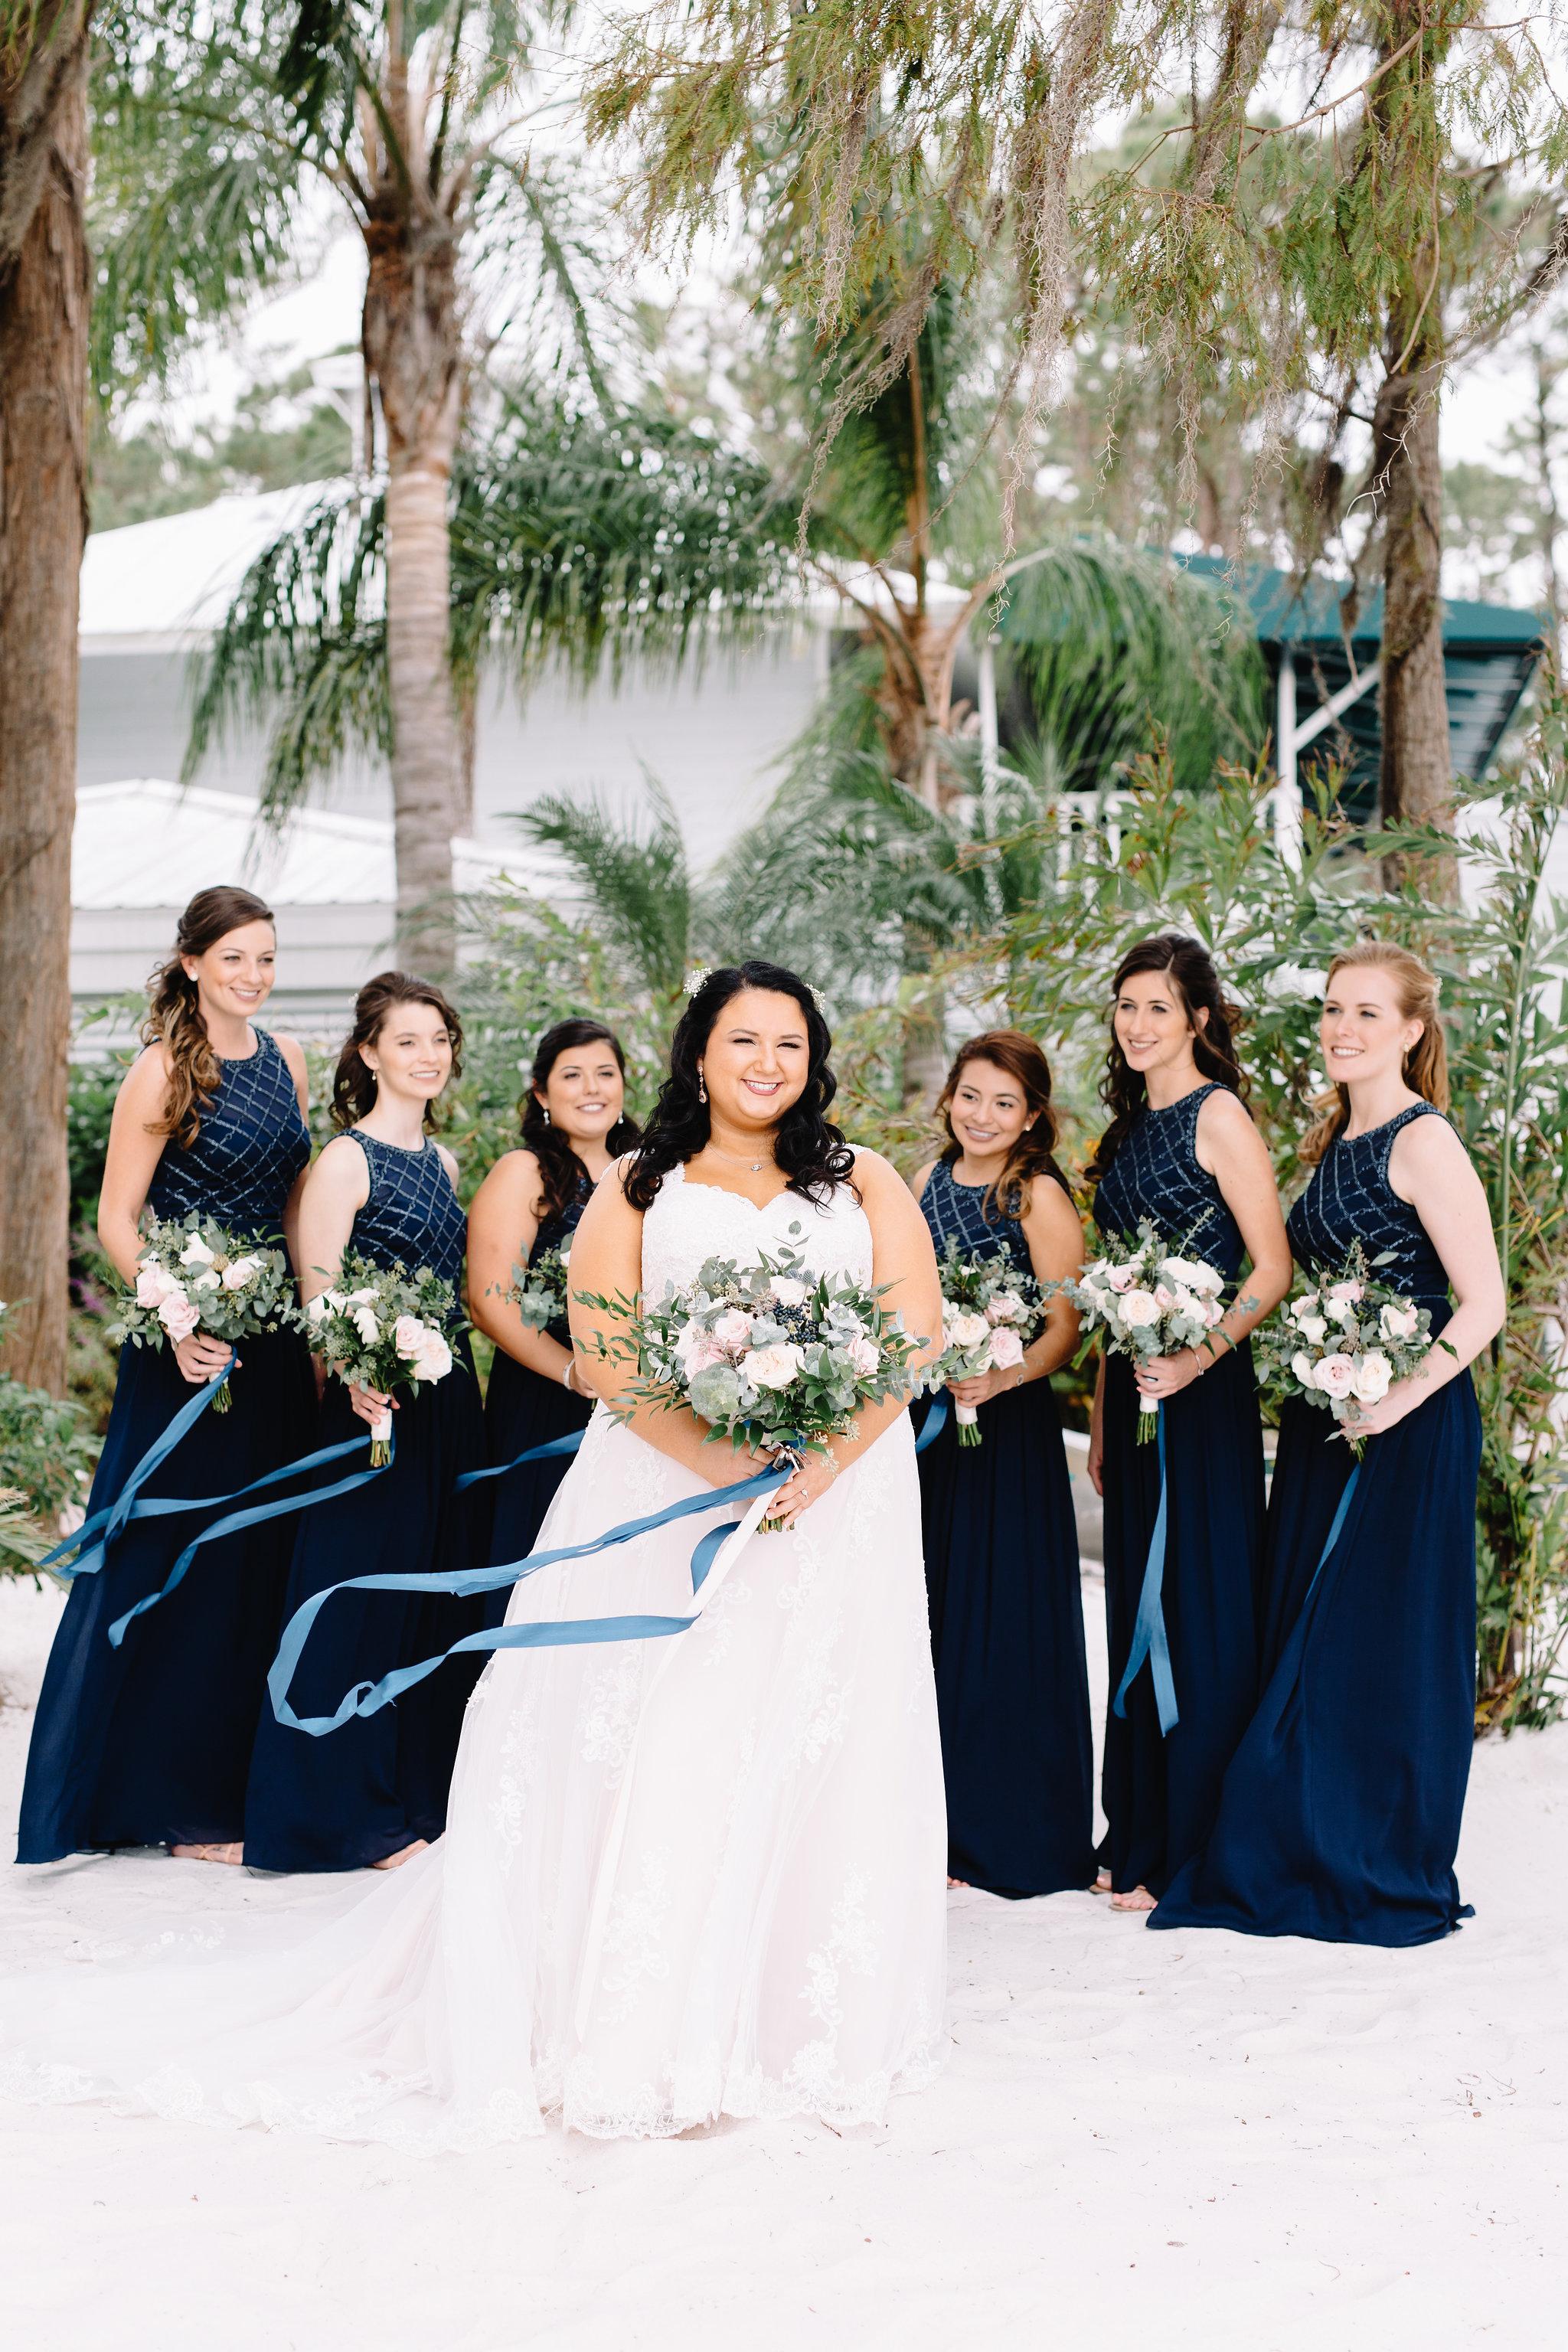 Orlando Wedding Planner Blue Ribbon Weddings  Orlando Wedding Photographer JP Pratt Photography  Wedding Ceremony & Reception at Paradise Cove Orlando